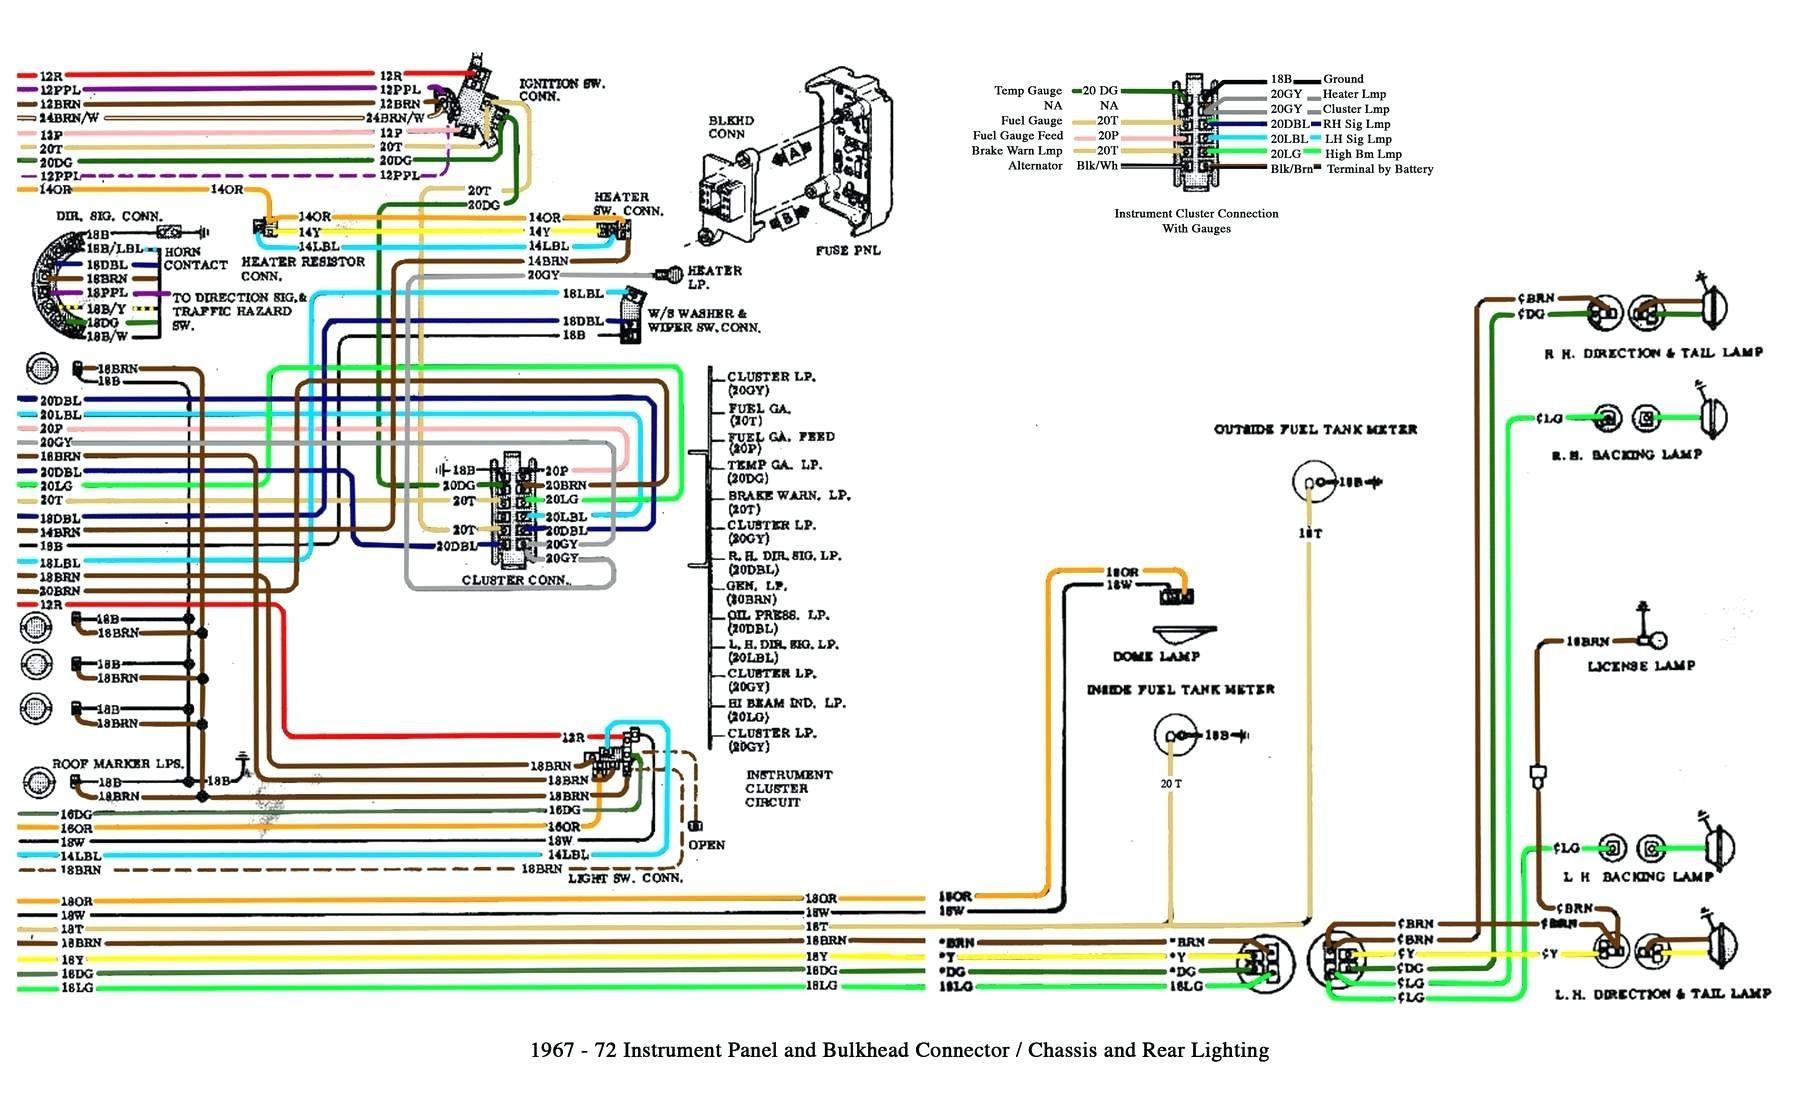 1994 Toyota Pickup Wiring Diagram Lexus Ls400 Alternator Beautiful Everything You Of